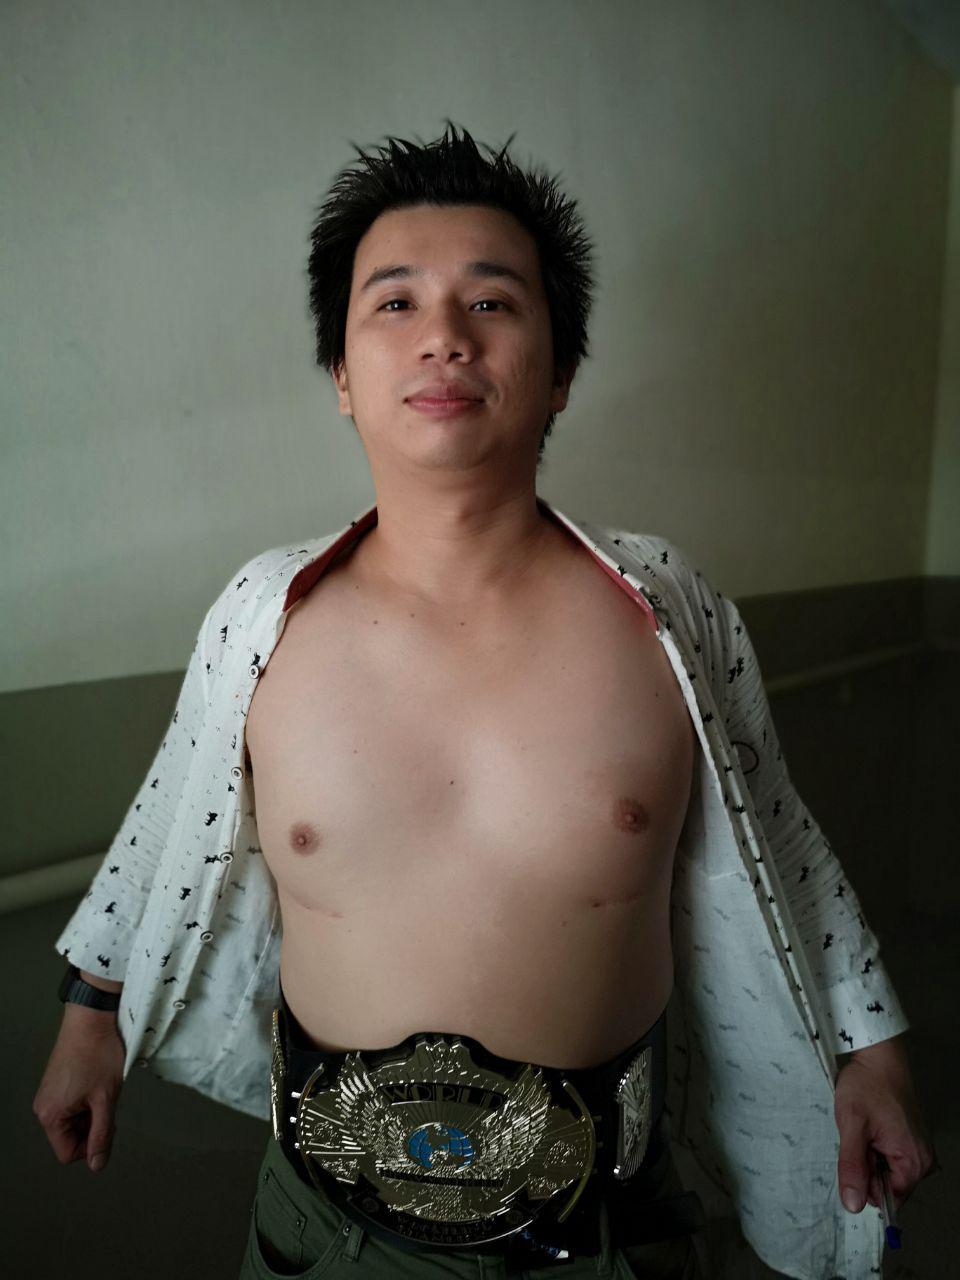 Rice-Media-Kurt-Tay-Father-Shemale-Breast-Implant-2